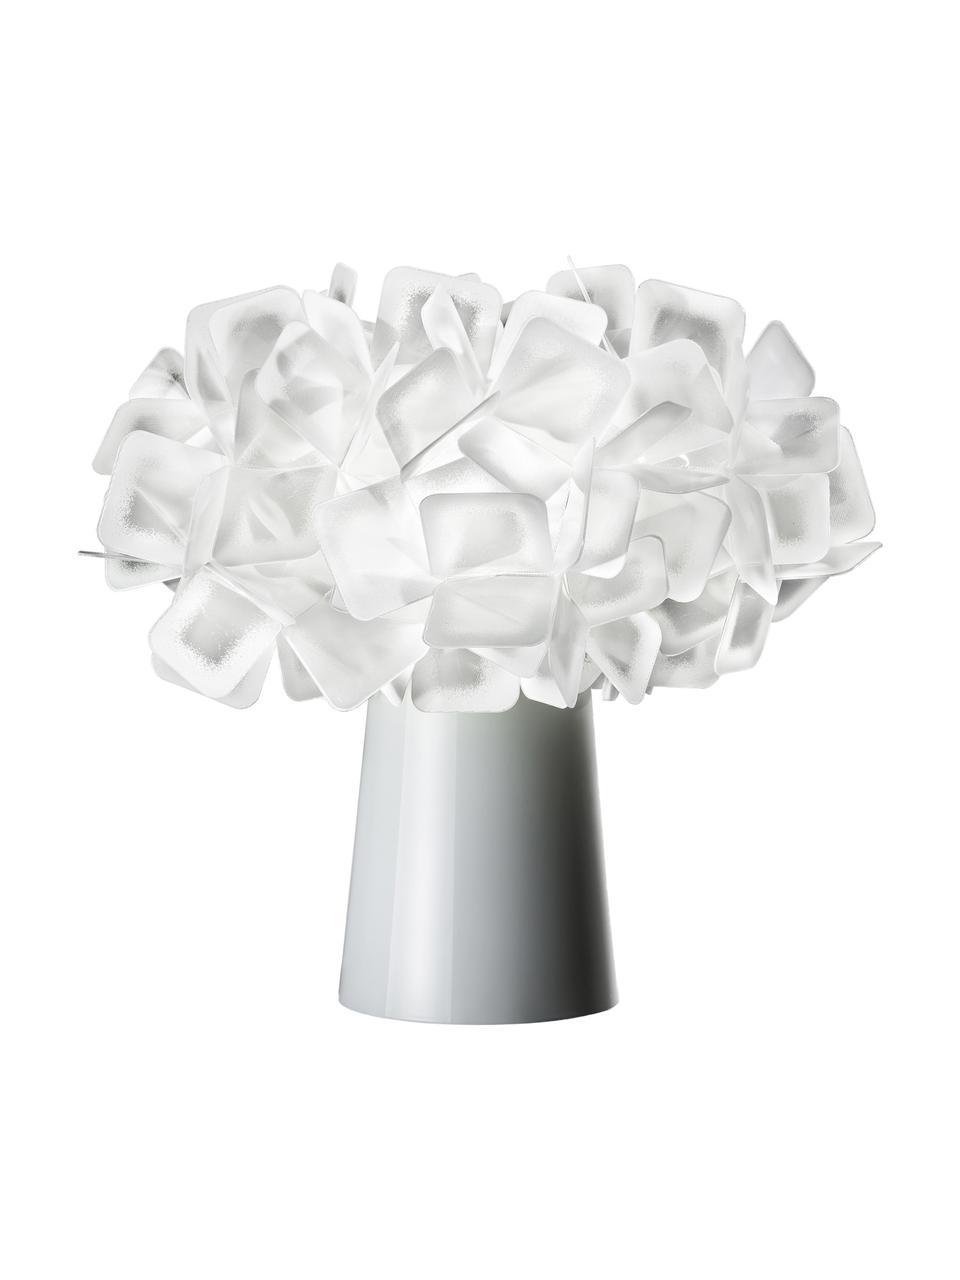 Petite lampe à poser design Clizia, Blanc